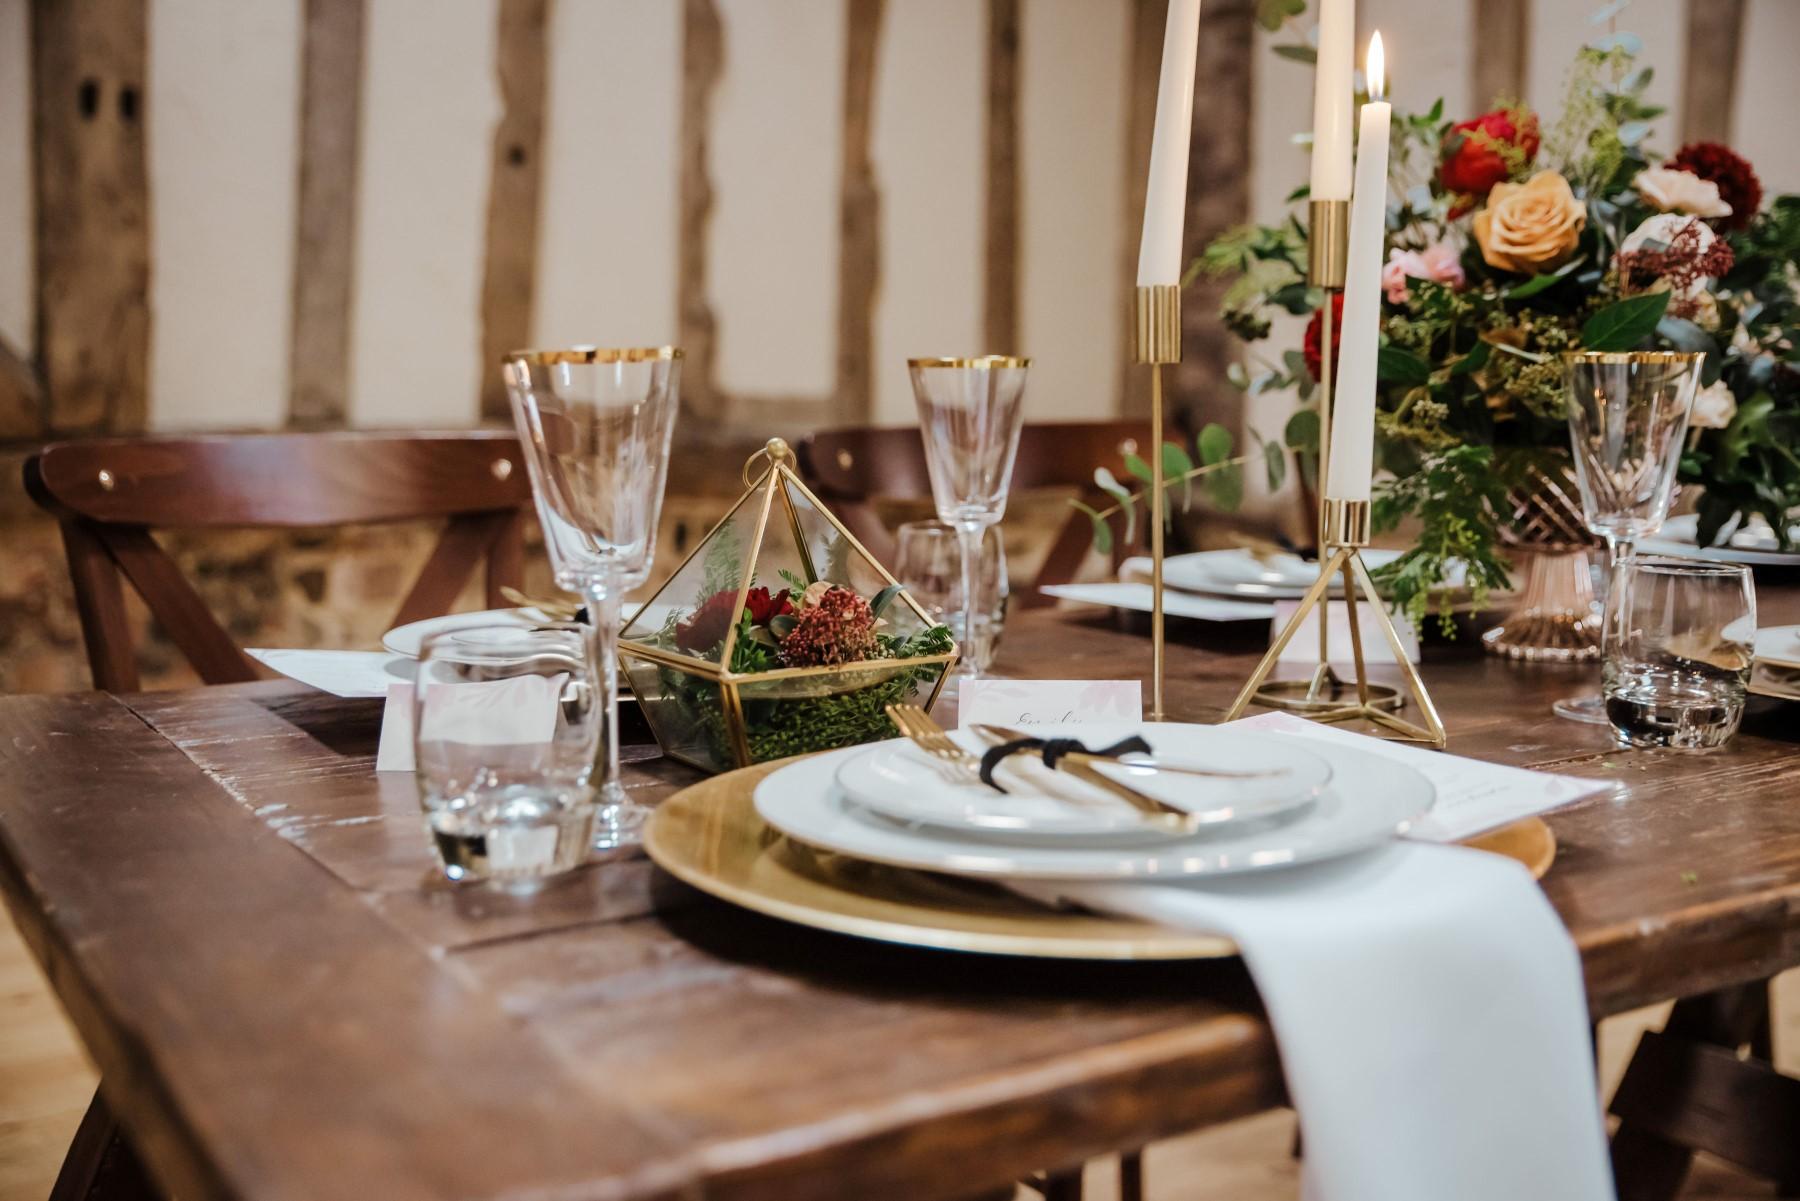 Roshni Photography- Barn Wedding Shoot- Table 2